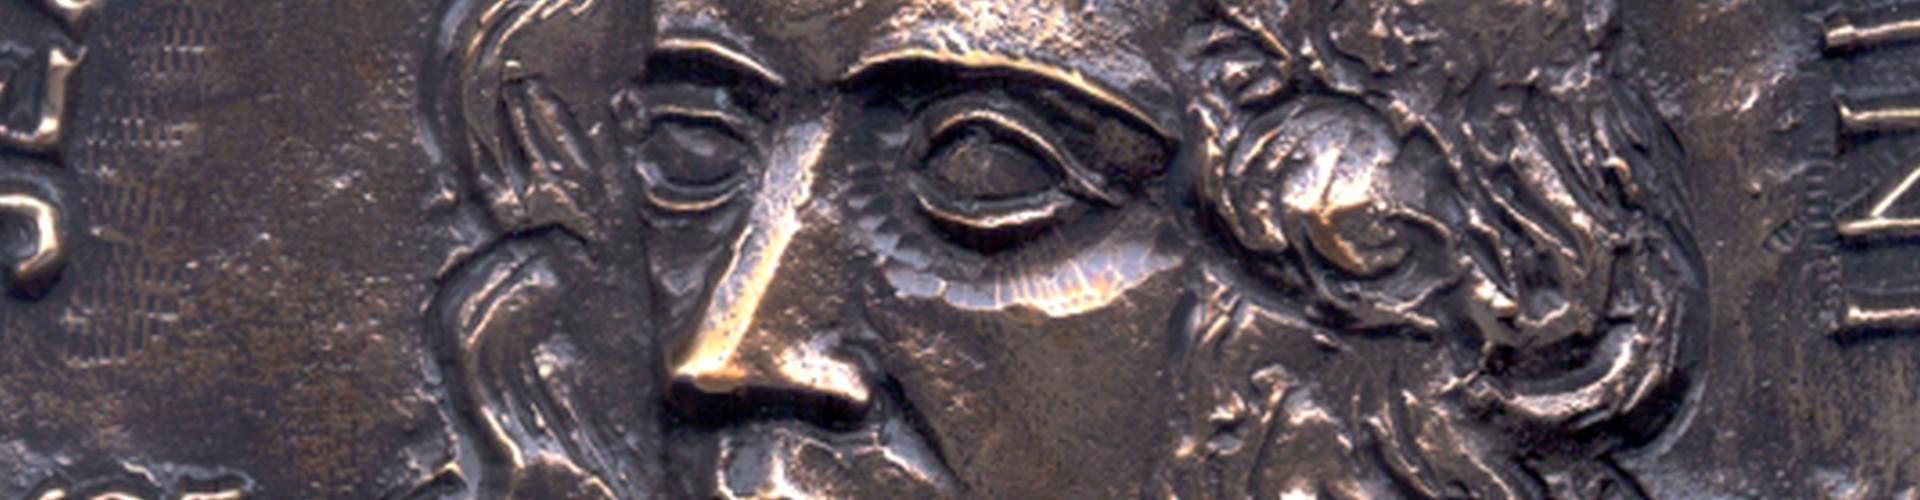 jean_dominique_cassini_medal_large.jpg